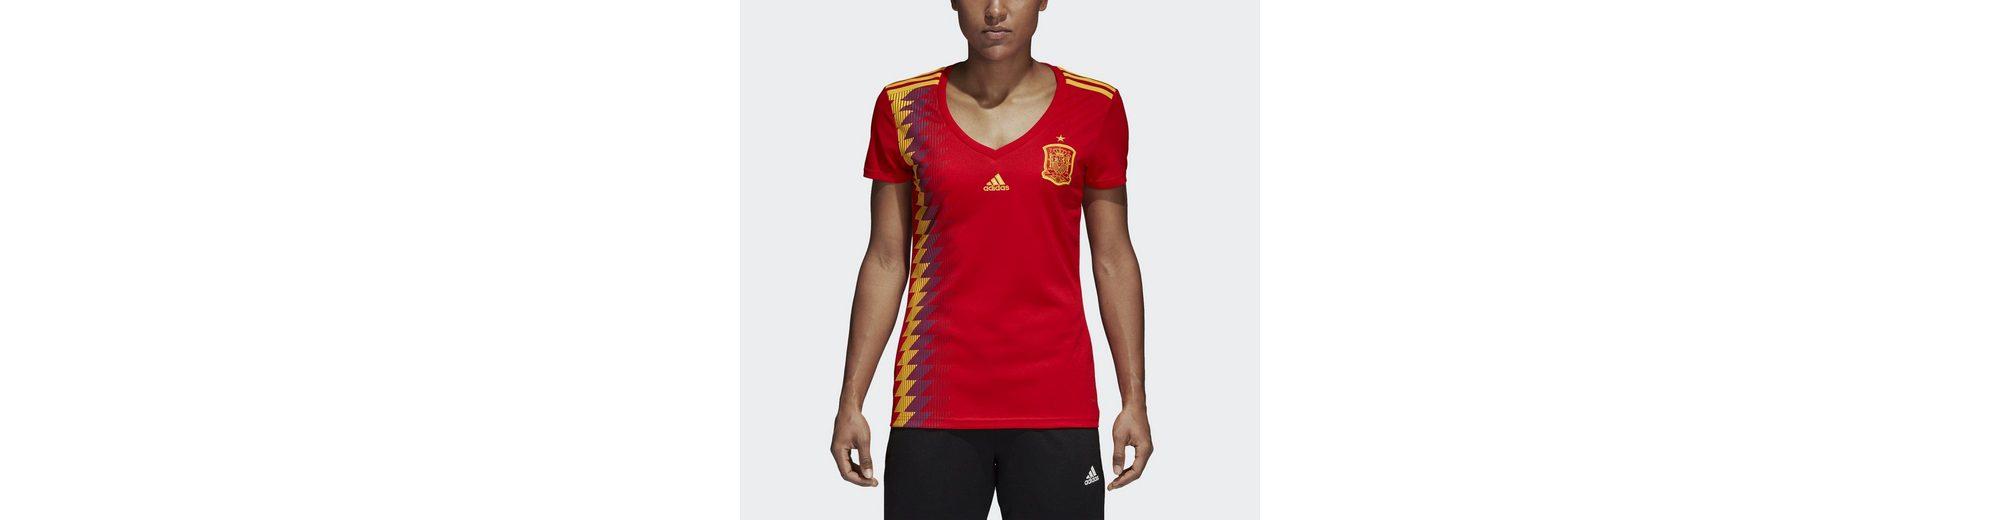 adidas Performance Footballtrikot adidas Spanien Spanien Heimtrikot Performance Heimtrikot Footballtrikot rPrawqd